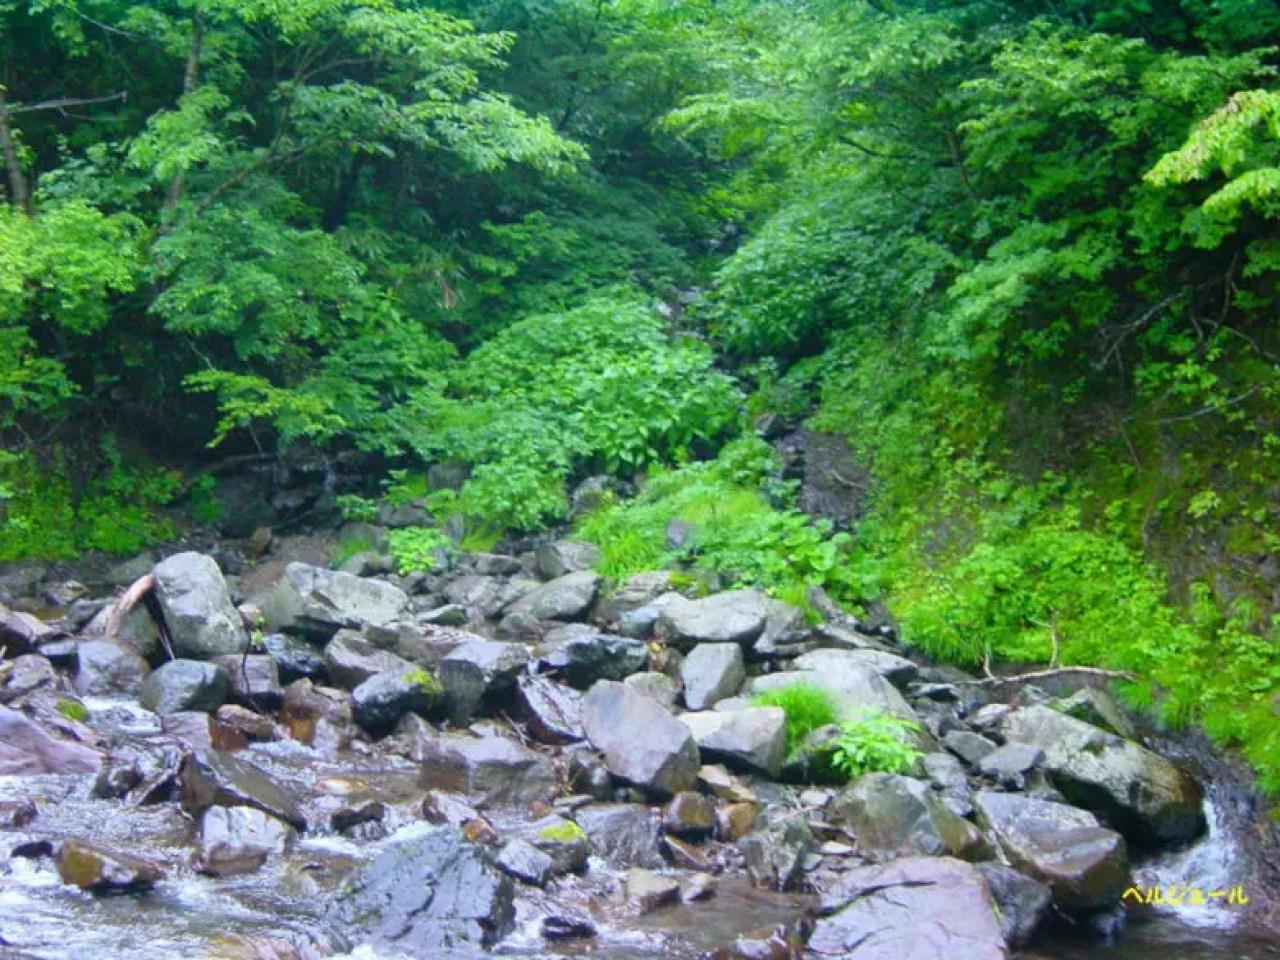 tokuyama00013 - 揖斐川上流・旧徳山村での岩魚釣り